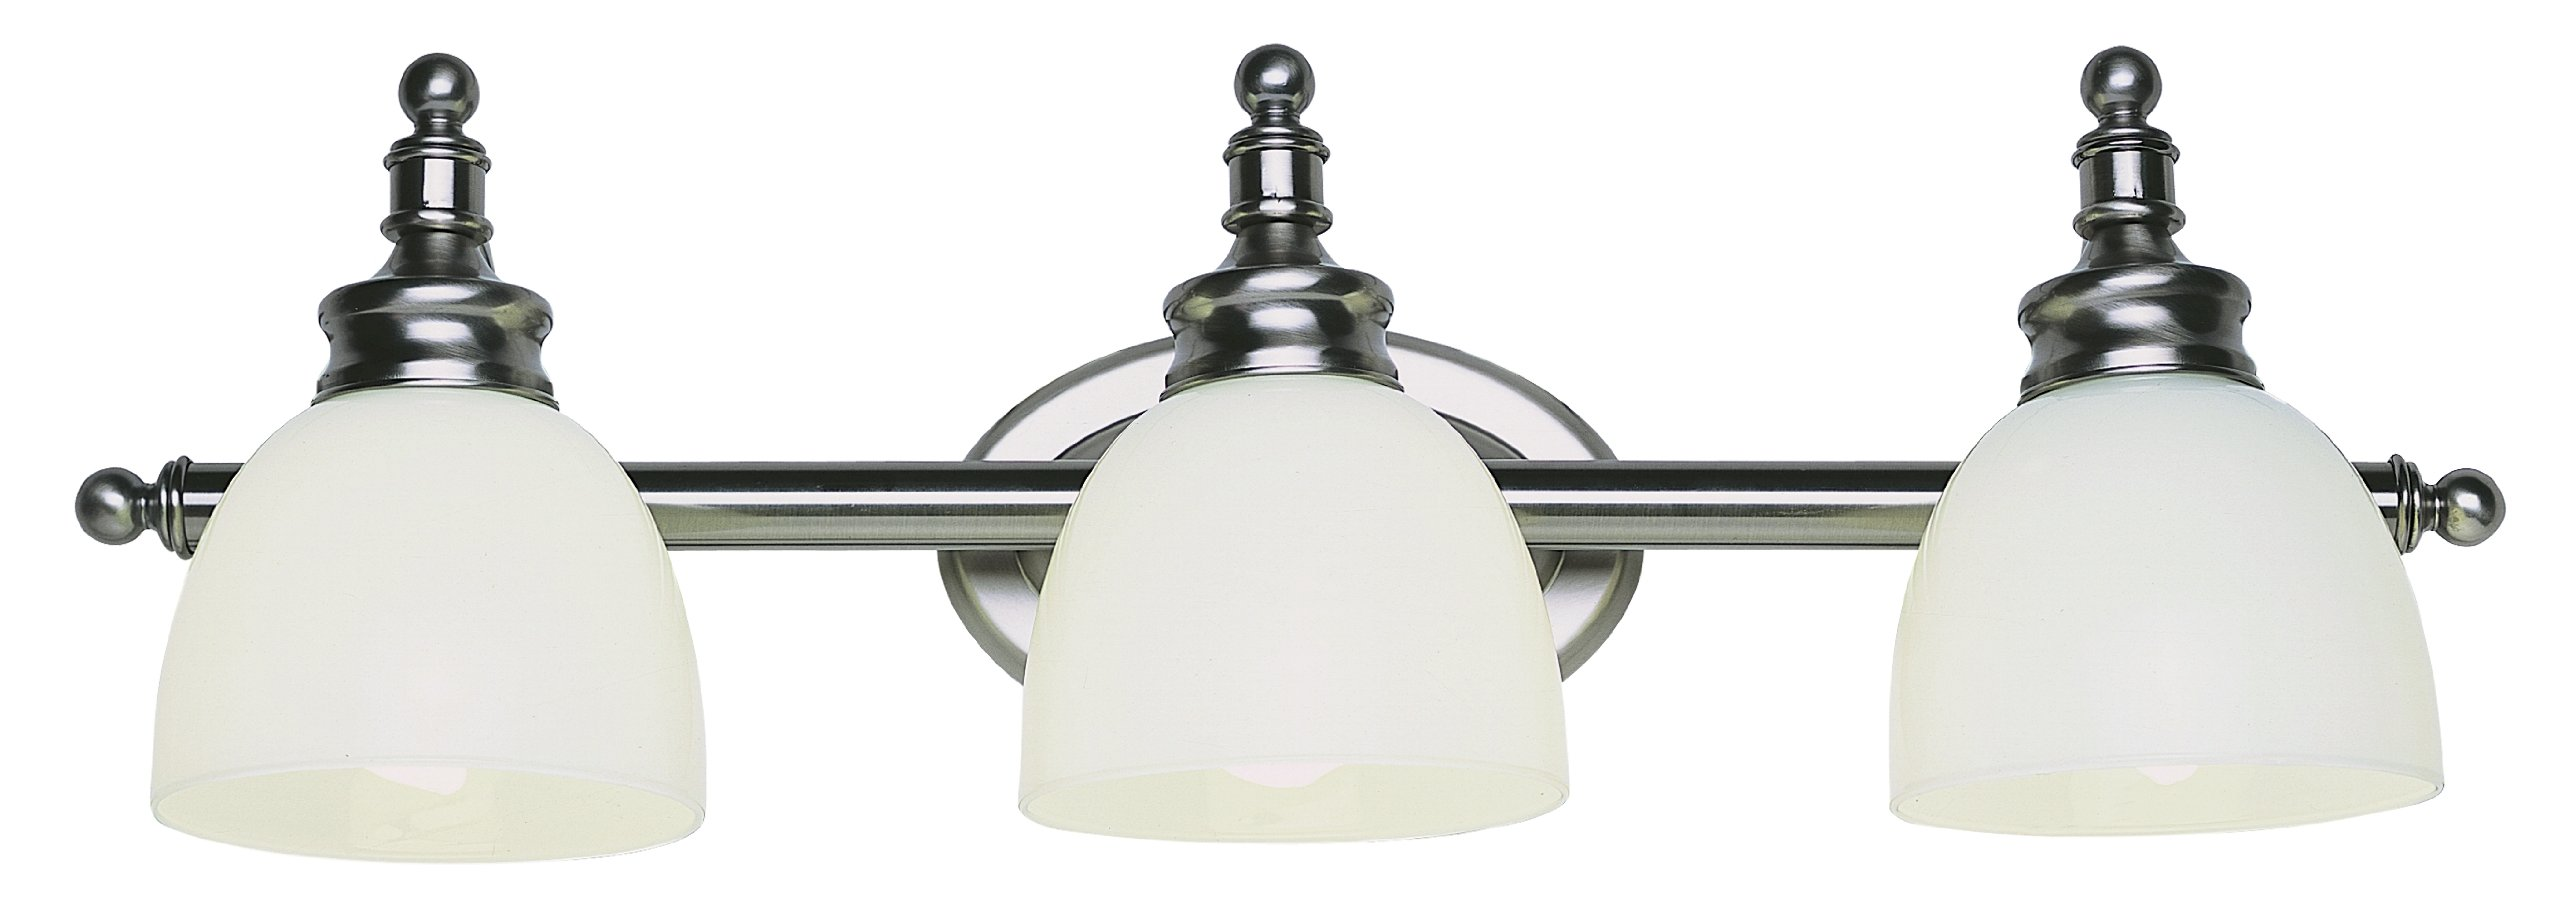 Trans Globe Lighting 34143 AN Indoor  Kovacs 27'' Vanity Bar, Antique Nickel